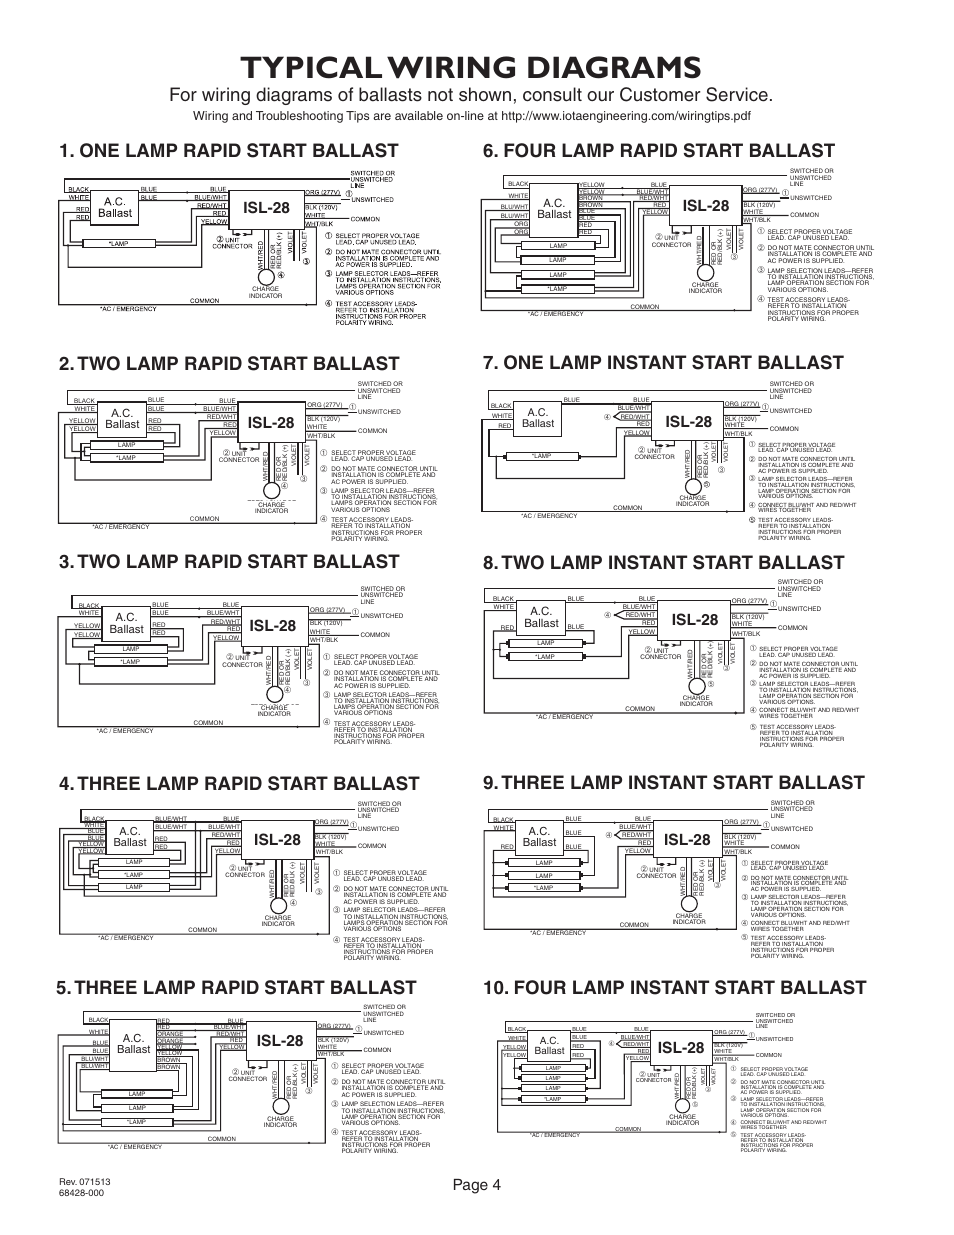 iota isl 28 page4?resize\\\\\\\\\\\\\\\\\\\\\\\\\\\\\\\=665%2C861 electric motors wiring schematic ks63bxmc 1820 craftsman,motors Electrolux Vacuum Parts Diagram at readyjetset.co